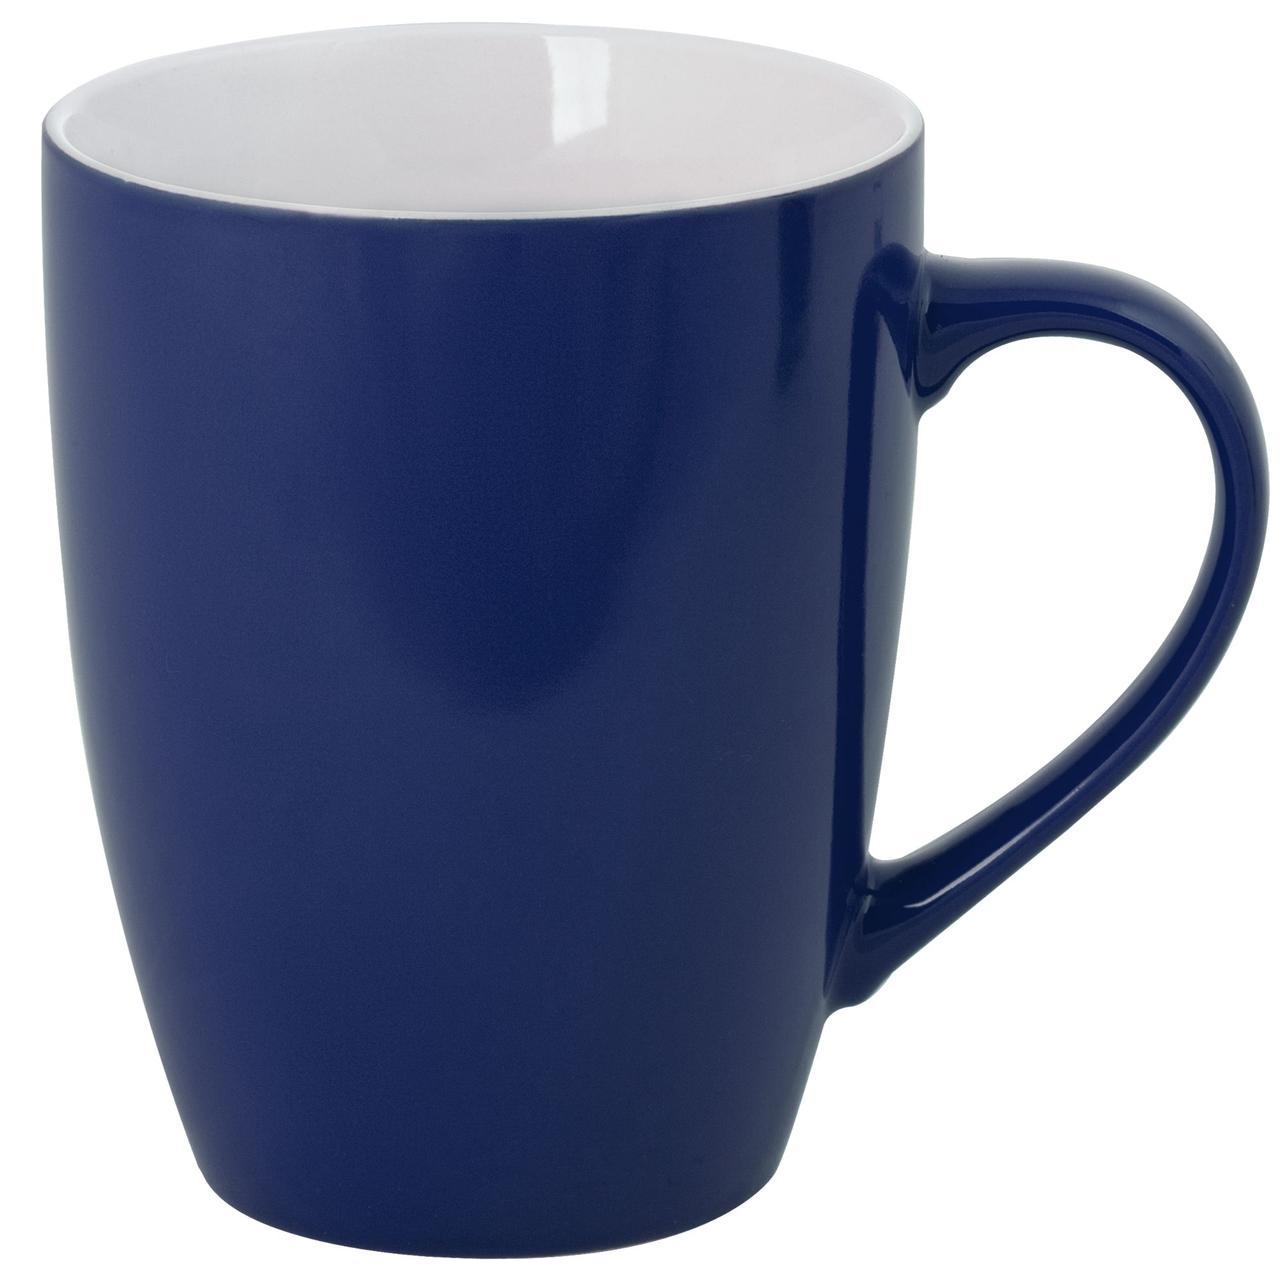 Кружка Good Morning, синяя (артикул 6478.40)